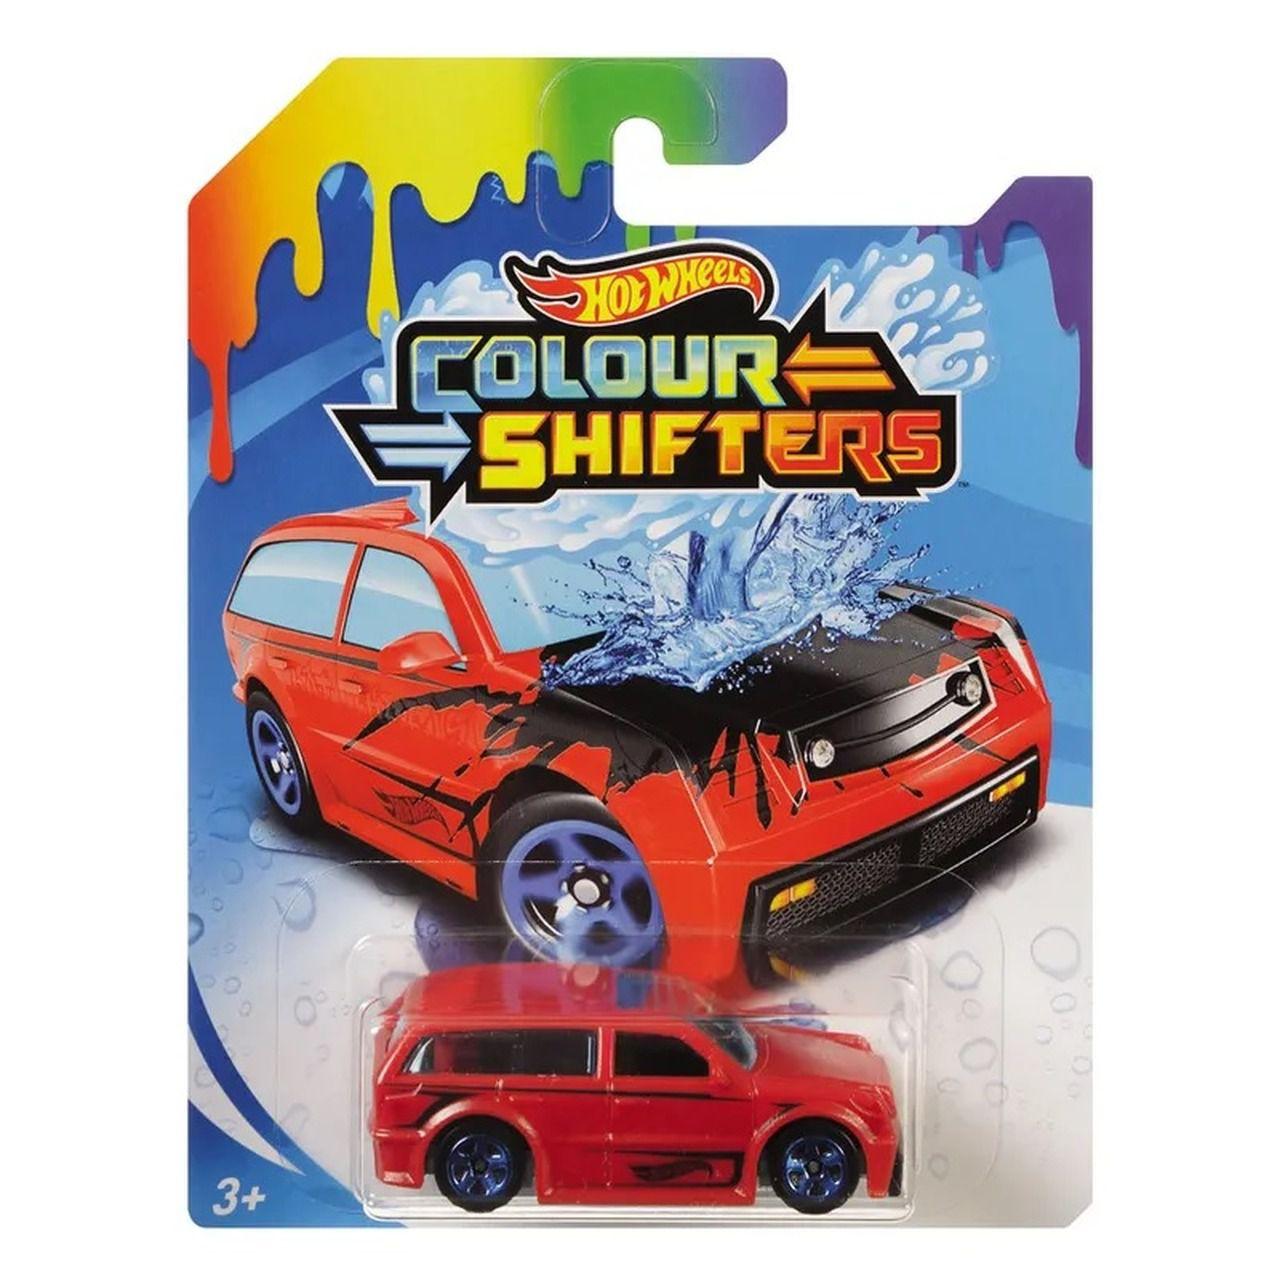 Carrinho Hot Wheels Colour Shifters: Boom Box - Mattel